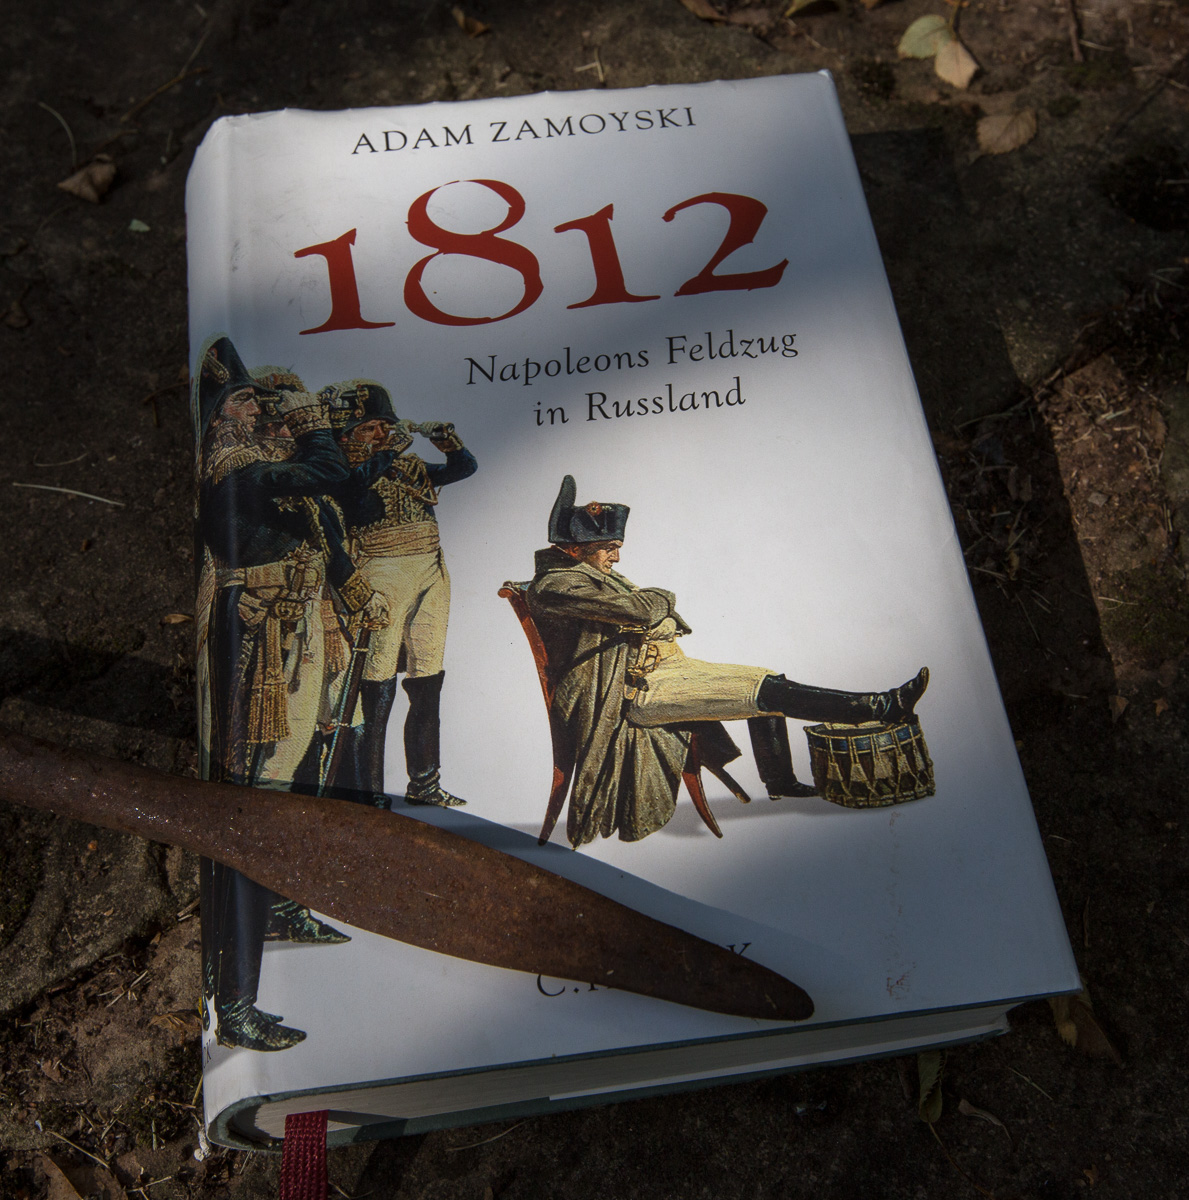 Adam Zamoyski, 1812. Napoleons Feldzug in Russland.